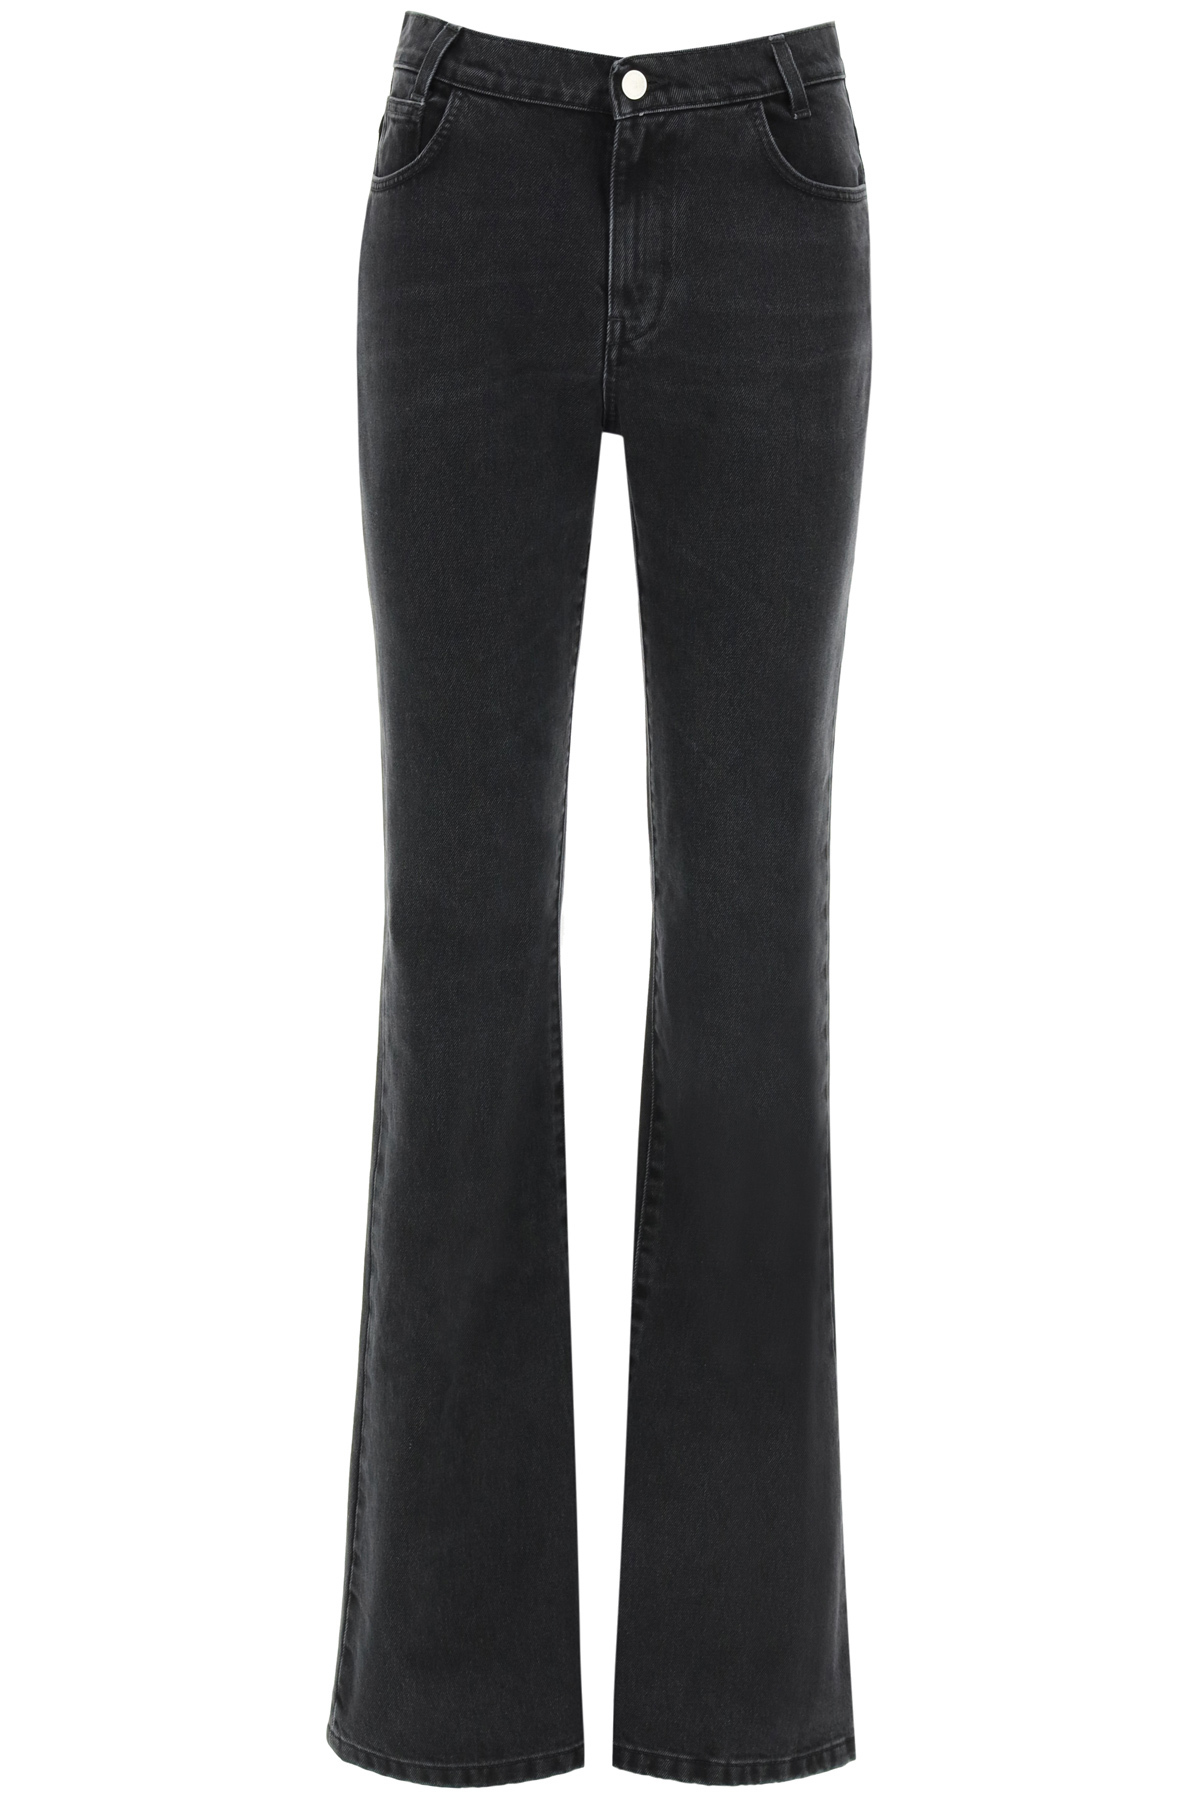 Raf simons jeans svasati a cinque tasche